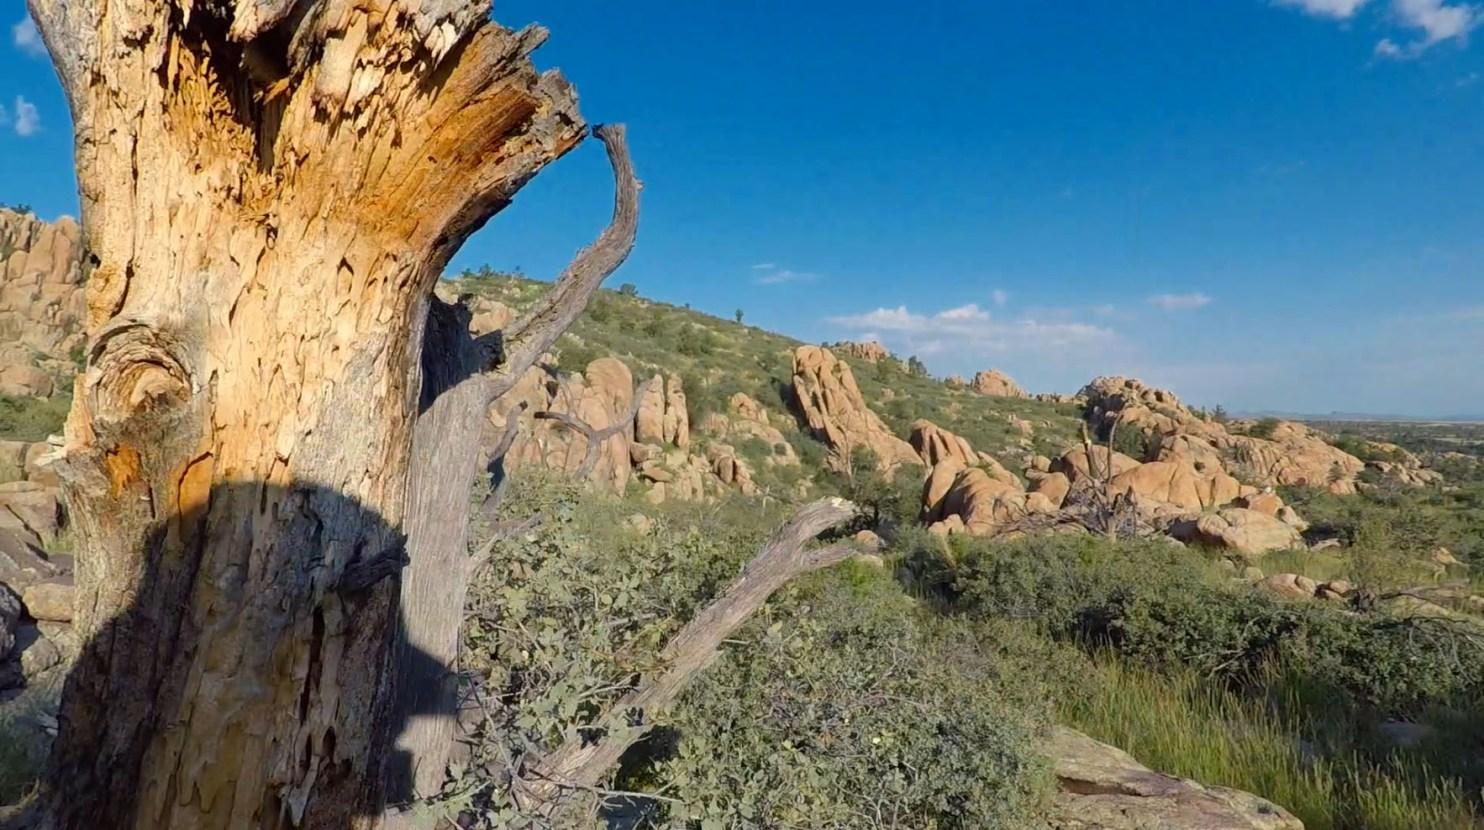 Constellation Trail Granite Dells Prescott Arizona Photographer Rich Charpentier